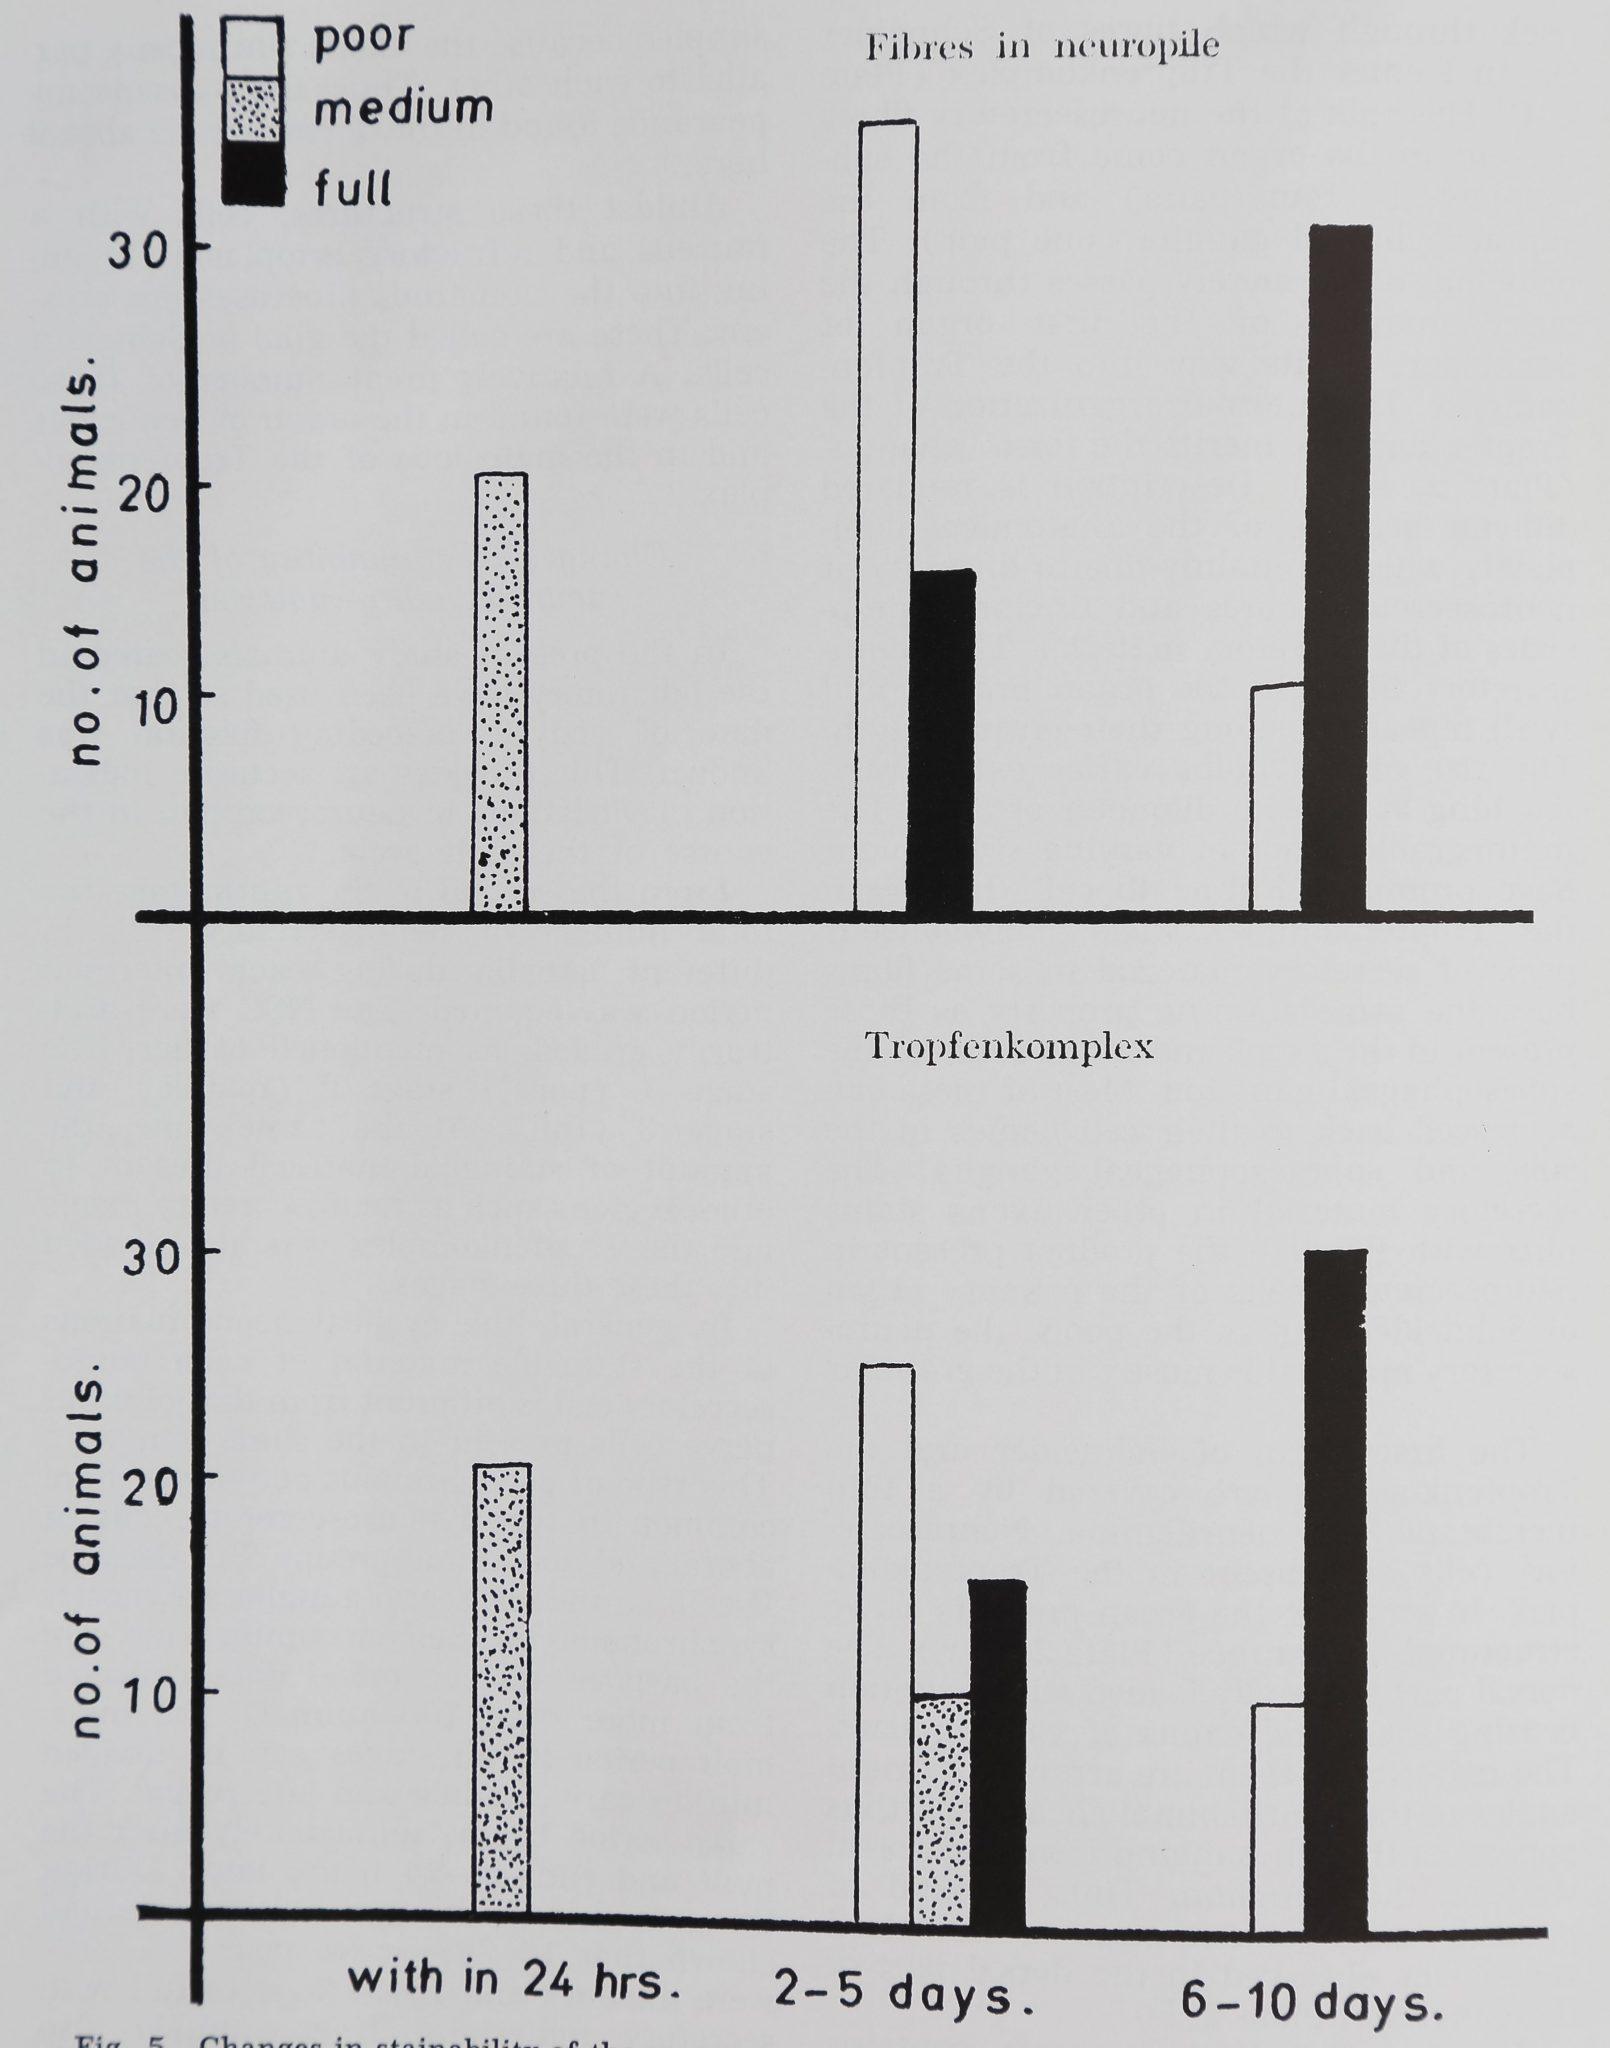 1973-HistoryOfTheNeurosecretory-5